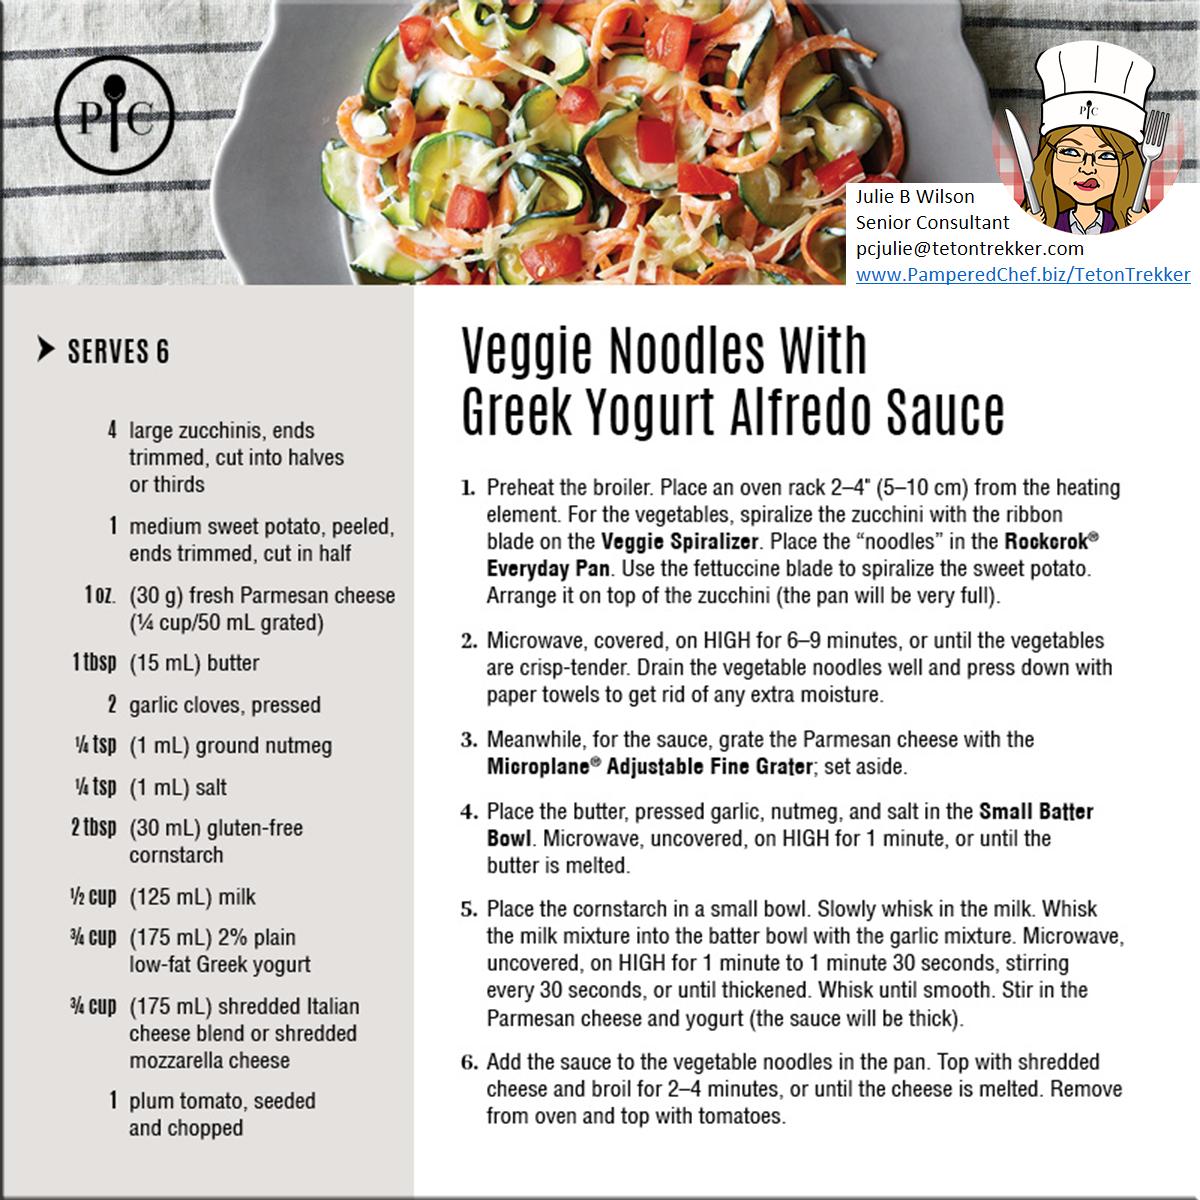 Veggie-Noodles-with-Greek-Yogurt-Alfredo-Sauce